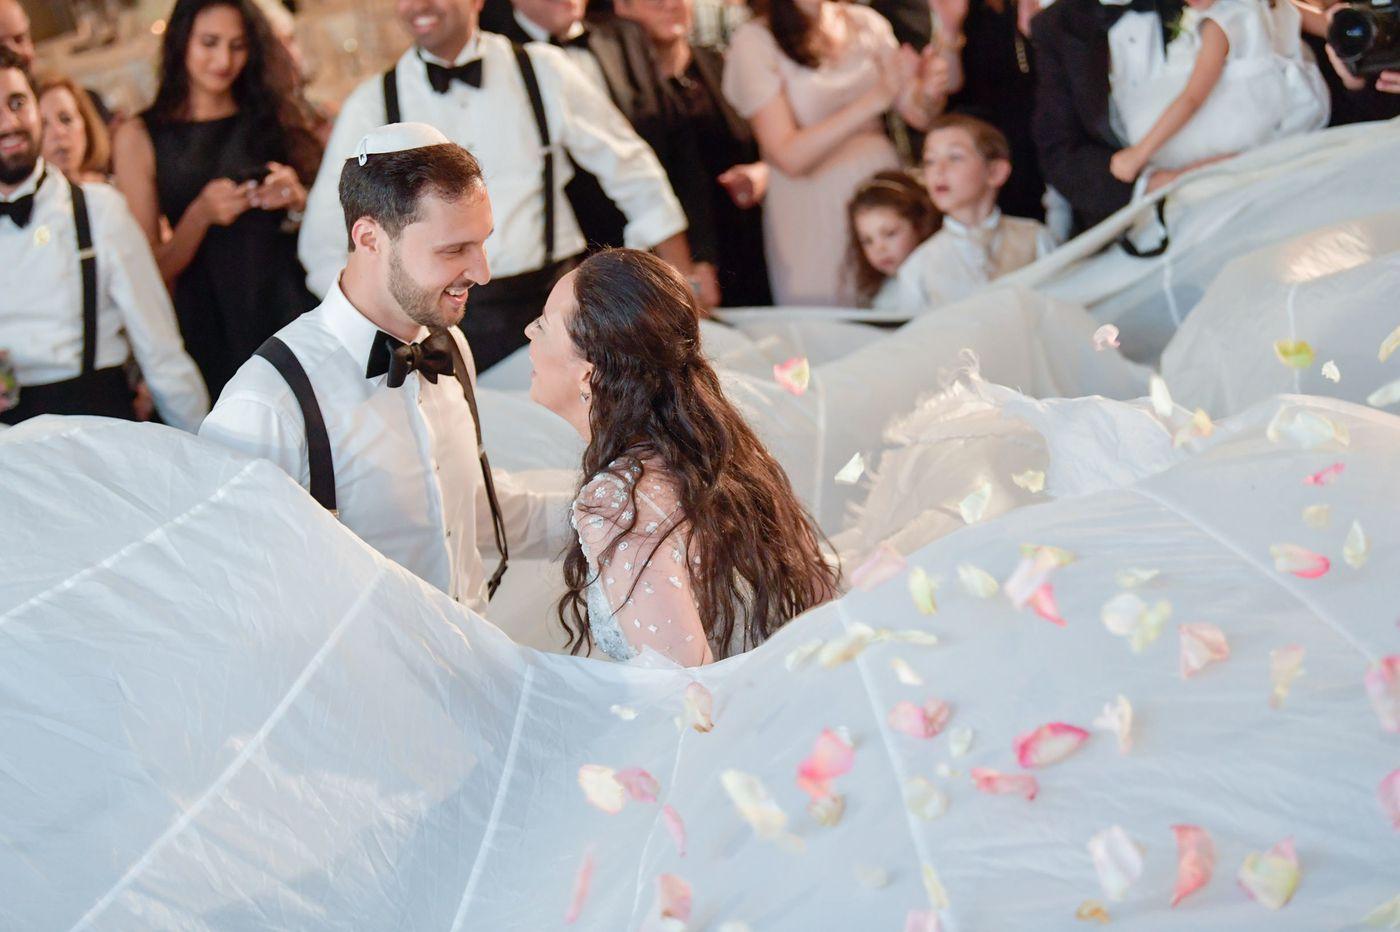 Philadelphia weddings: Arielle Belfer and Jacob Wischnia